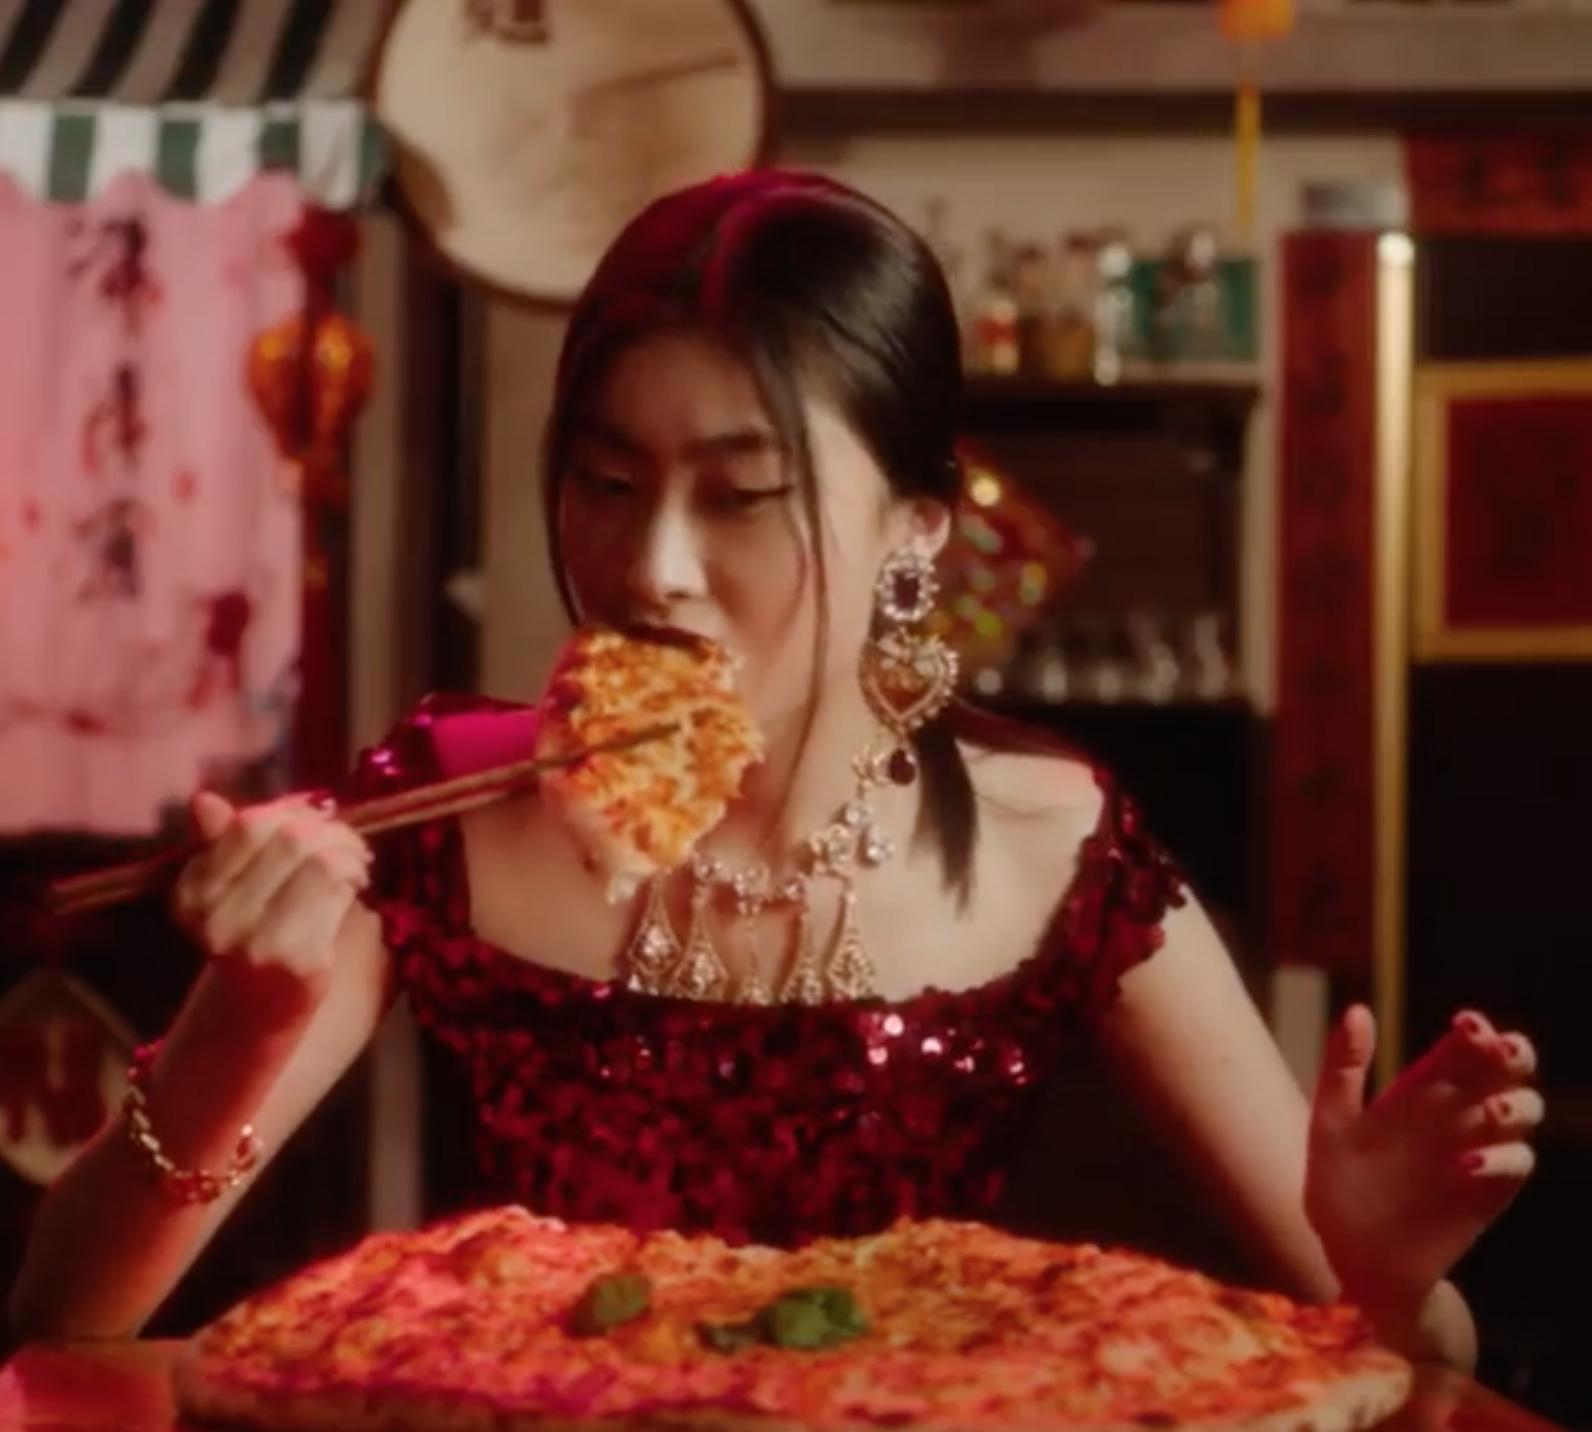 dd817d0e153c8 Dolce   Gabbana cancels Shanghai show amid  racist  ad controversy - CNN  Style